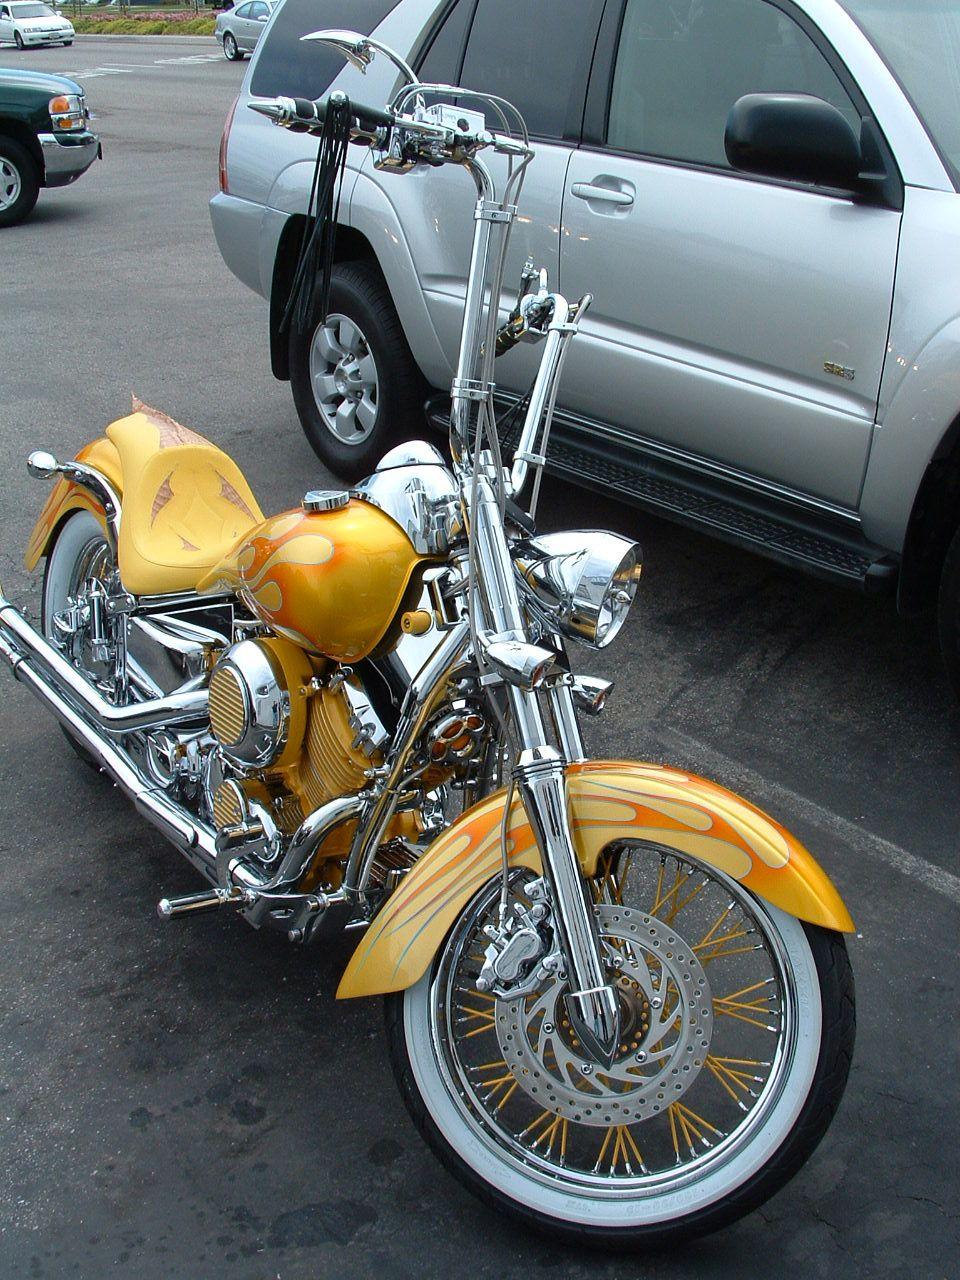 1996 yamaha drag star 650 custom motorcycling yamaha. Black Bedroom Furniture Sets. Home Design Ideas